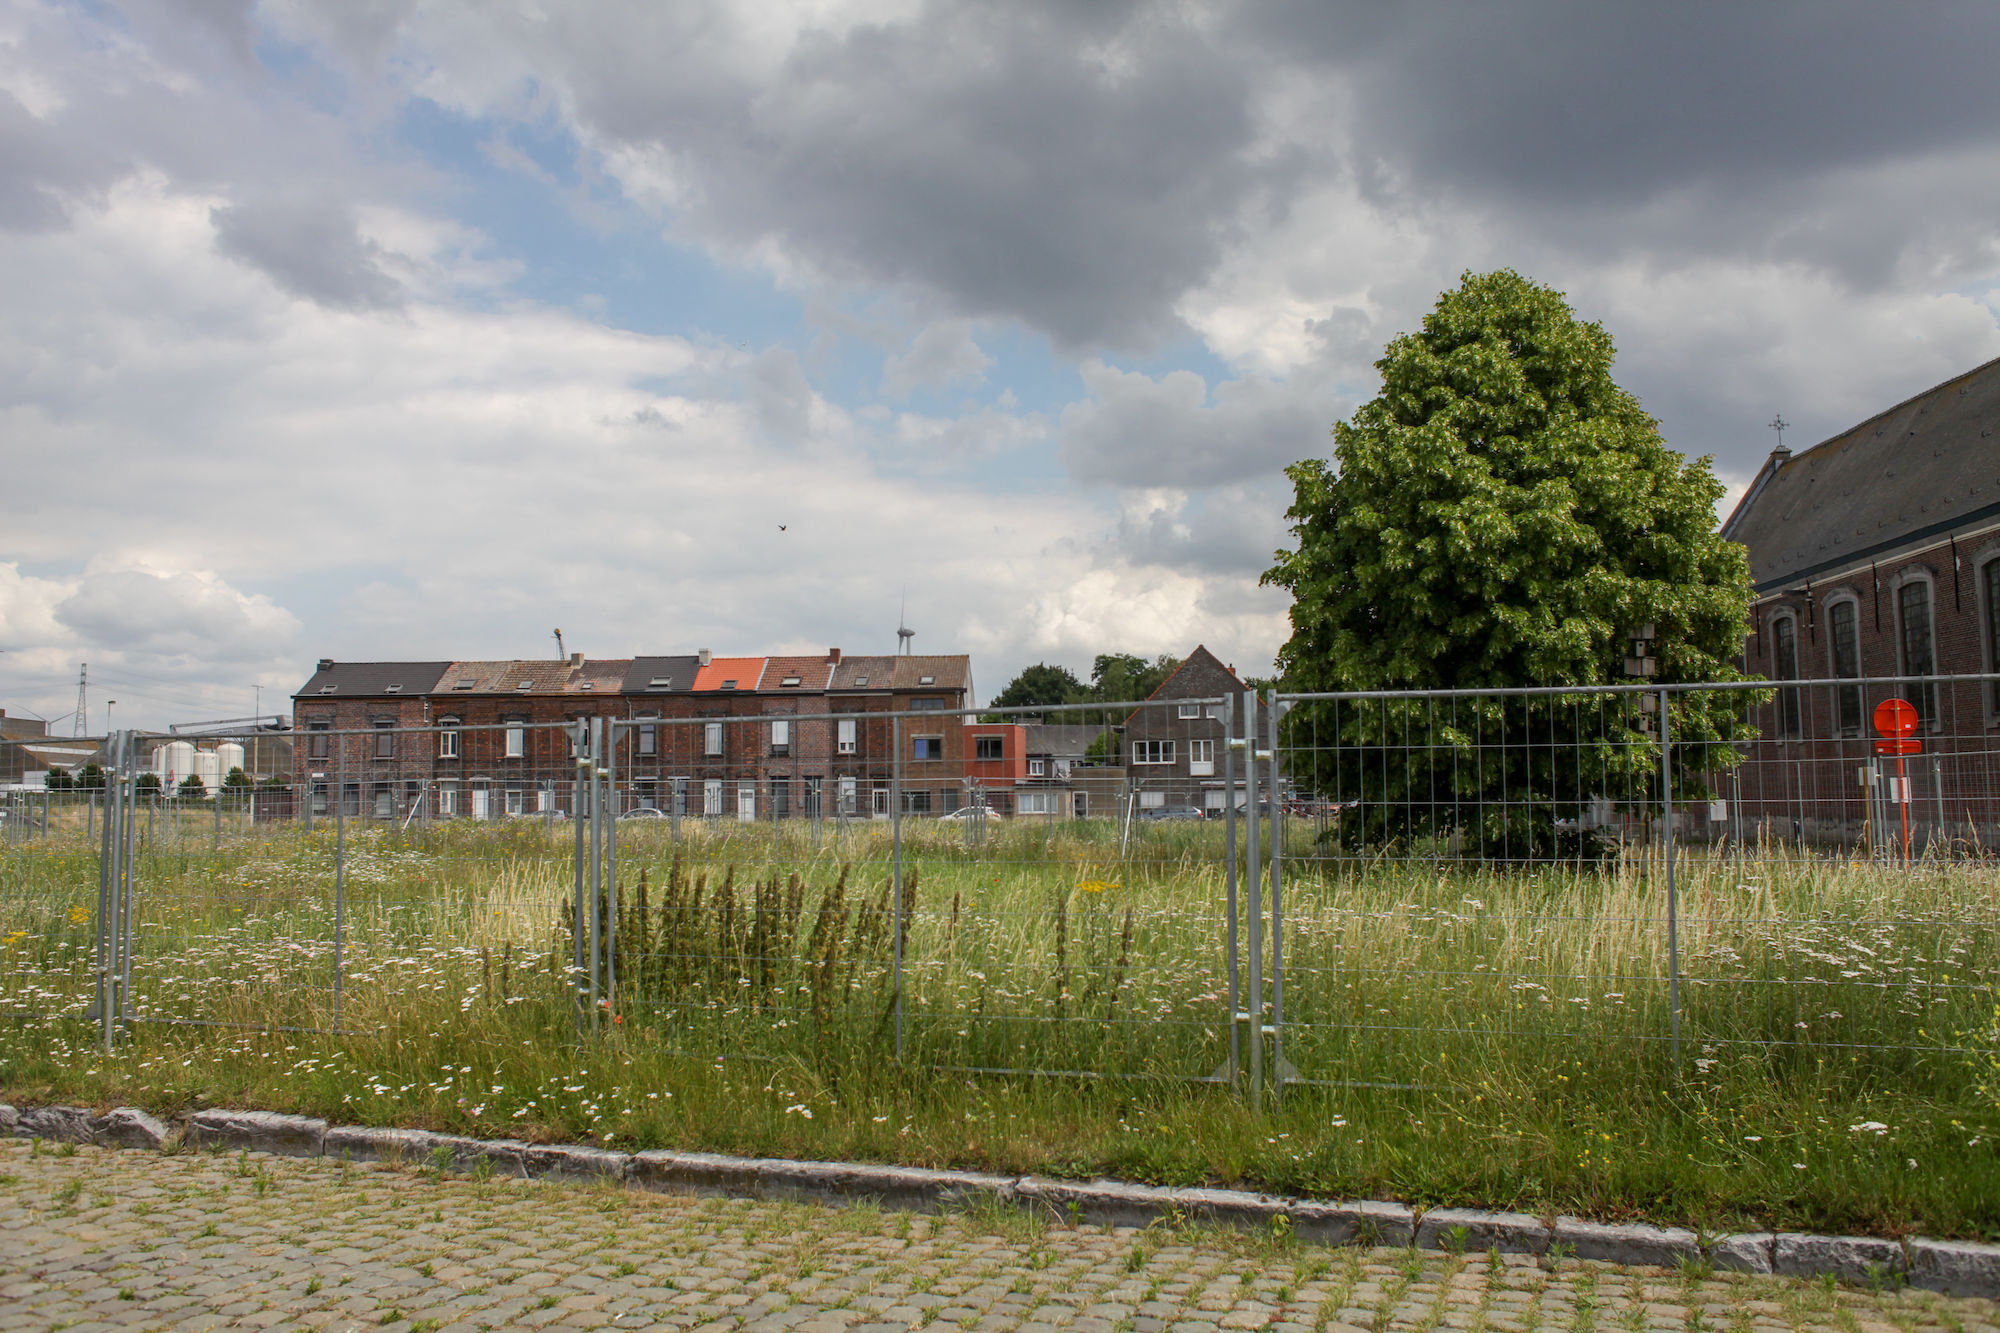 2019-07-02 Muide Meulestede prospectie Wannes_stadsvernieuwing_IMG_0374-3.jpg